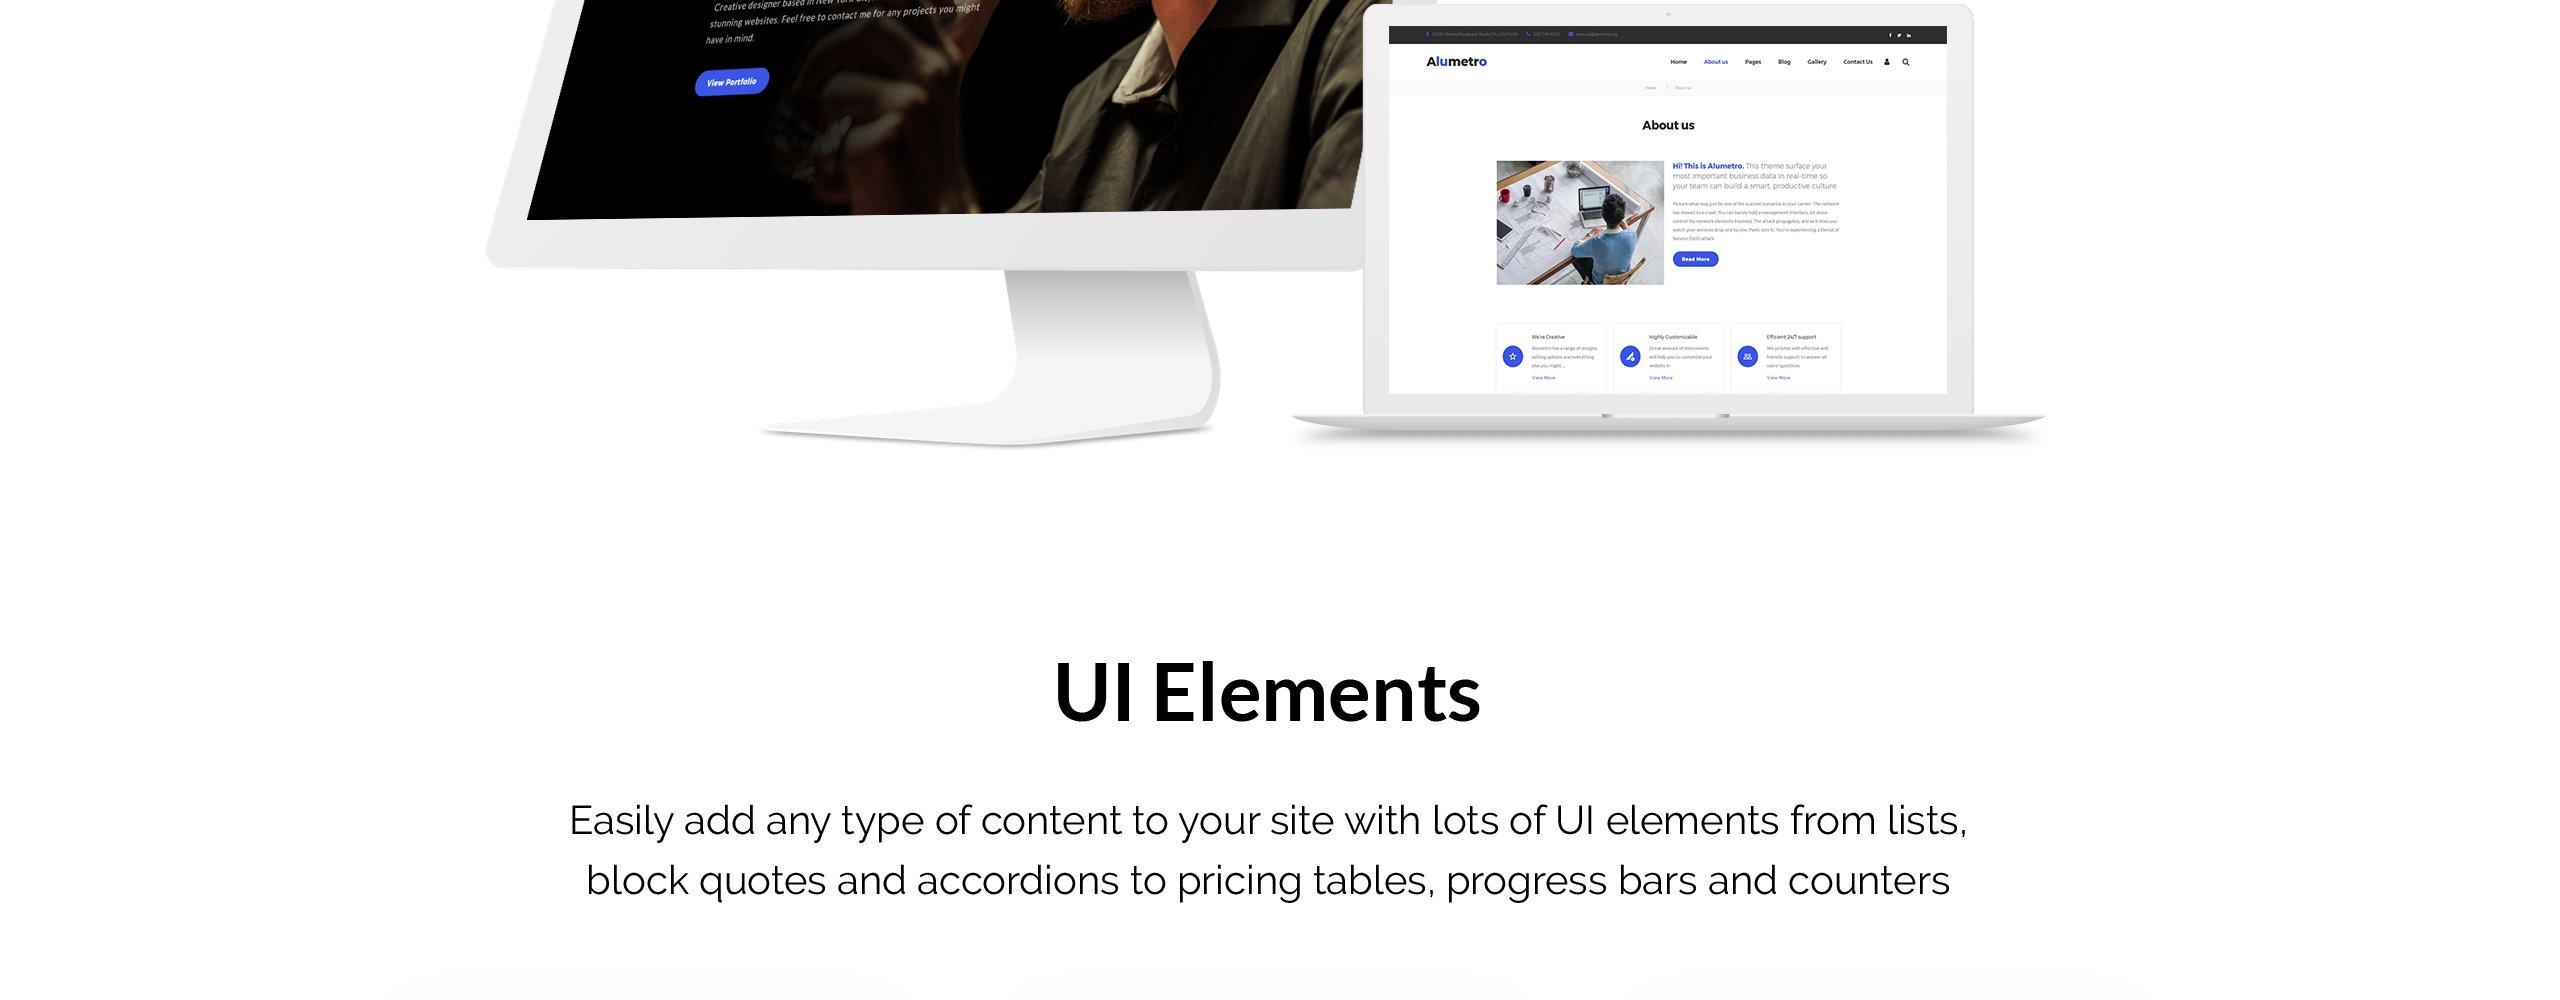 Website Design Template 70802 - career personal premium portfolio gallery blog post project service multipurpose responsive visual seo html